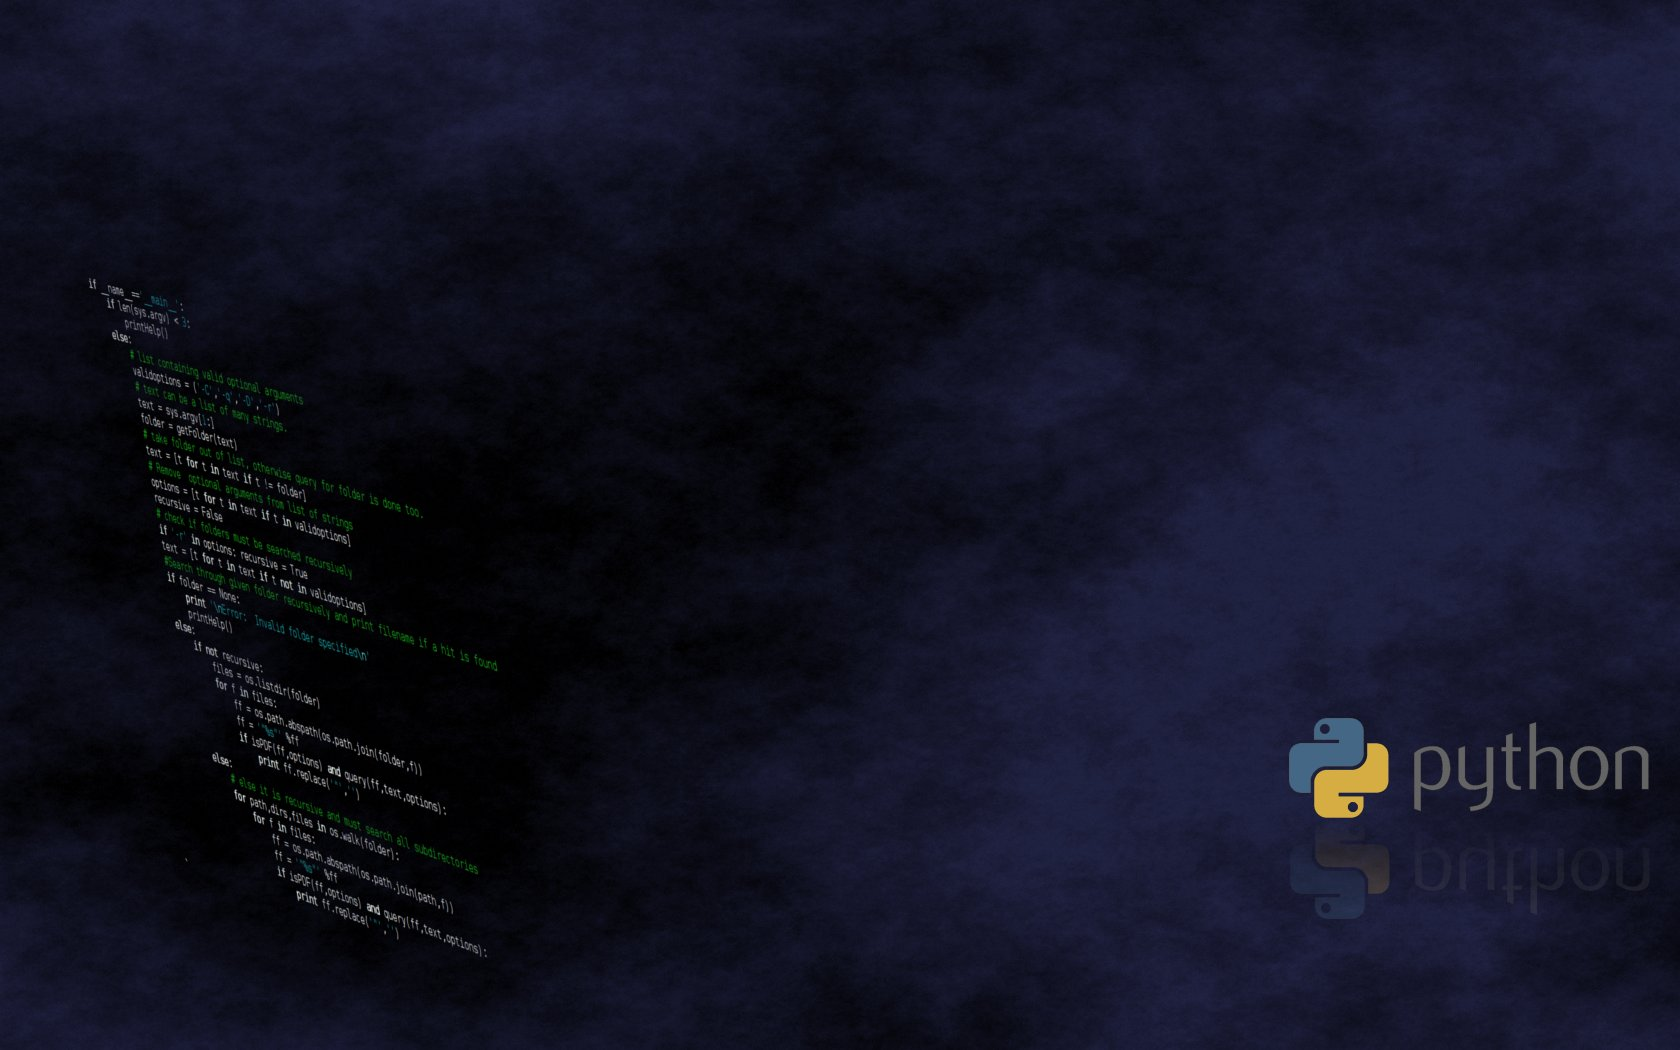 Python   Programming Wallpaper 35141649 1680x1050